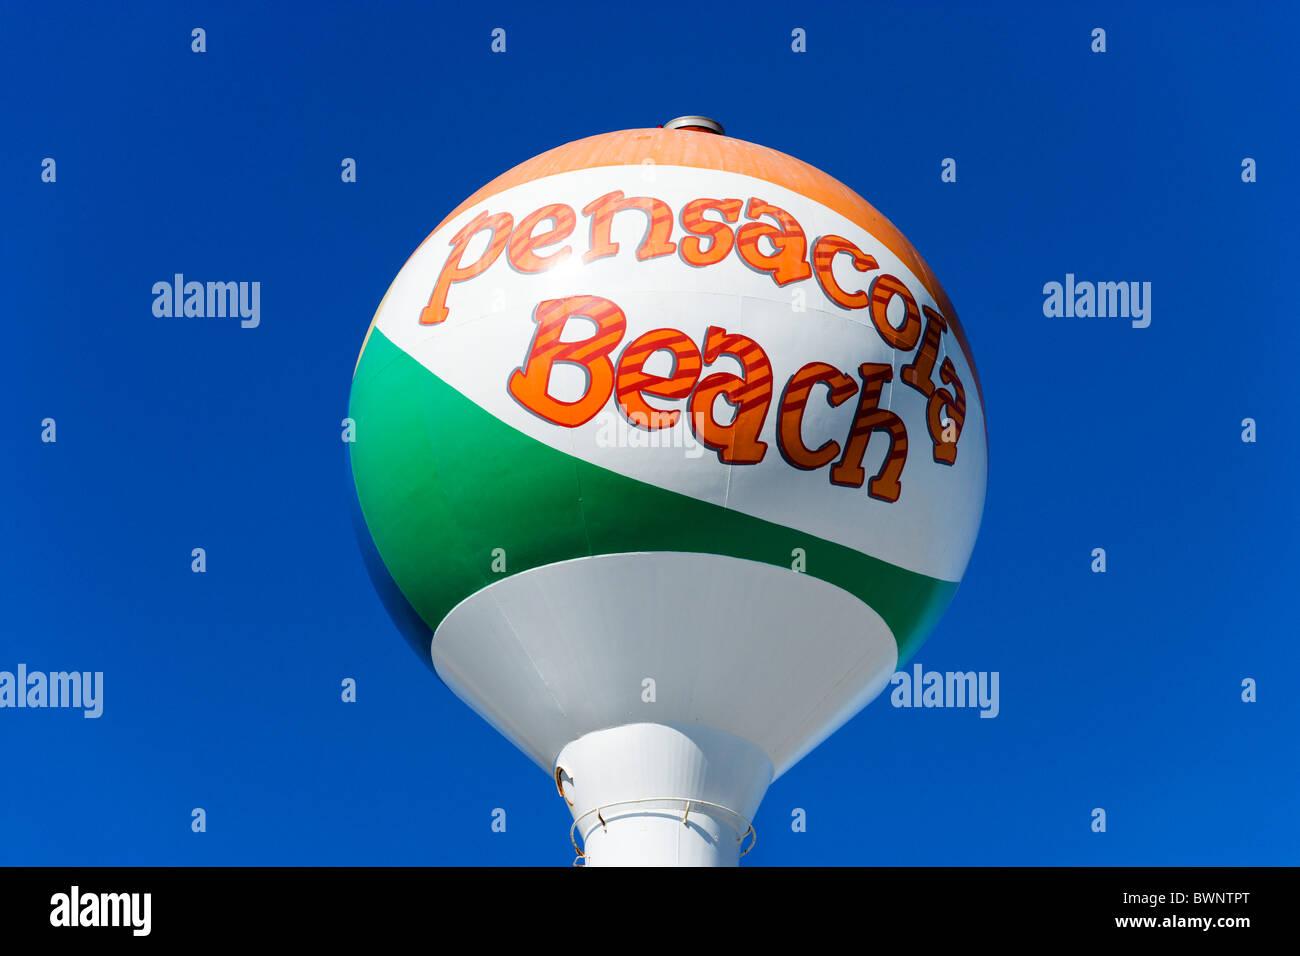 Sign for Pensacola Beach, Gulf Coast, Florida, USA - Stock Image